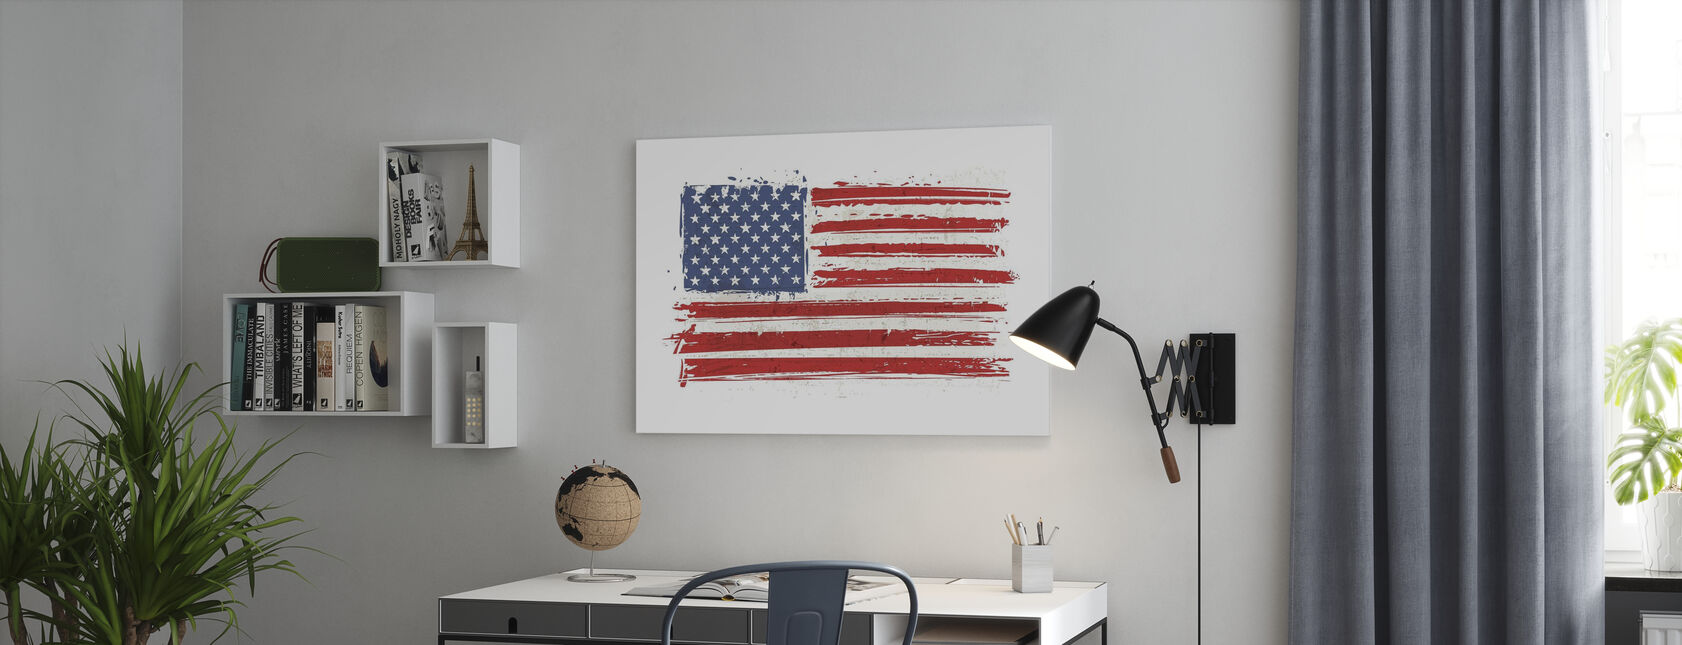 Flag USA - Canvastavla - Kontor